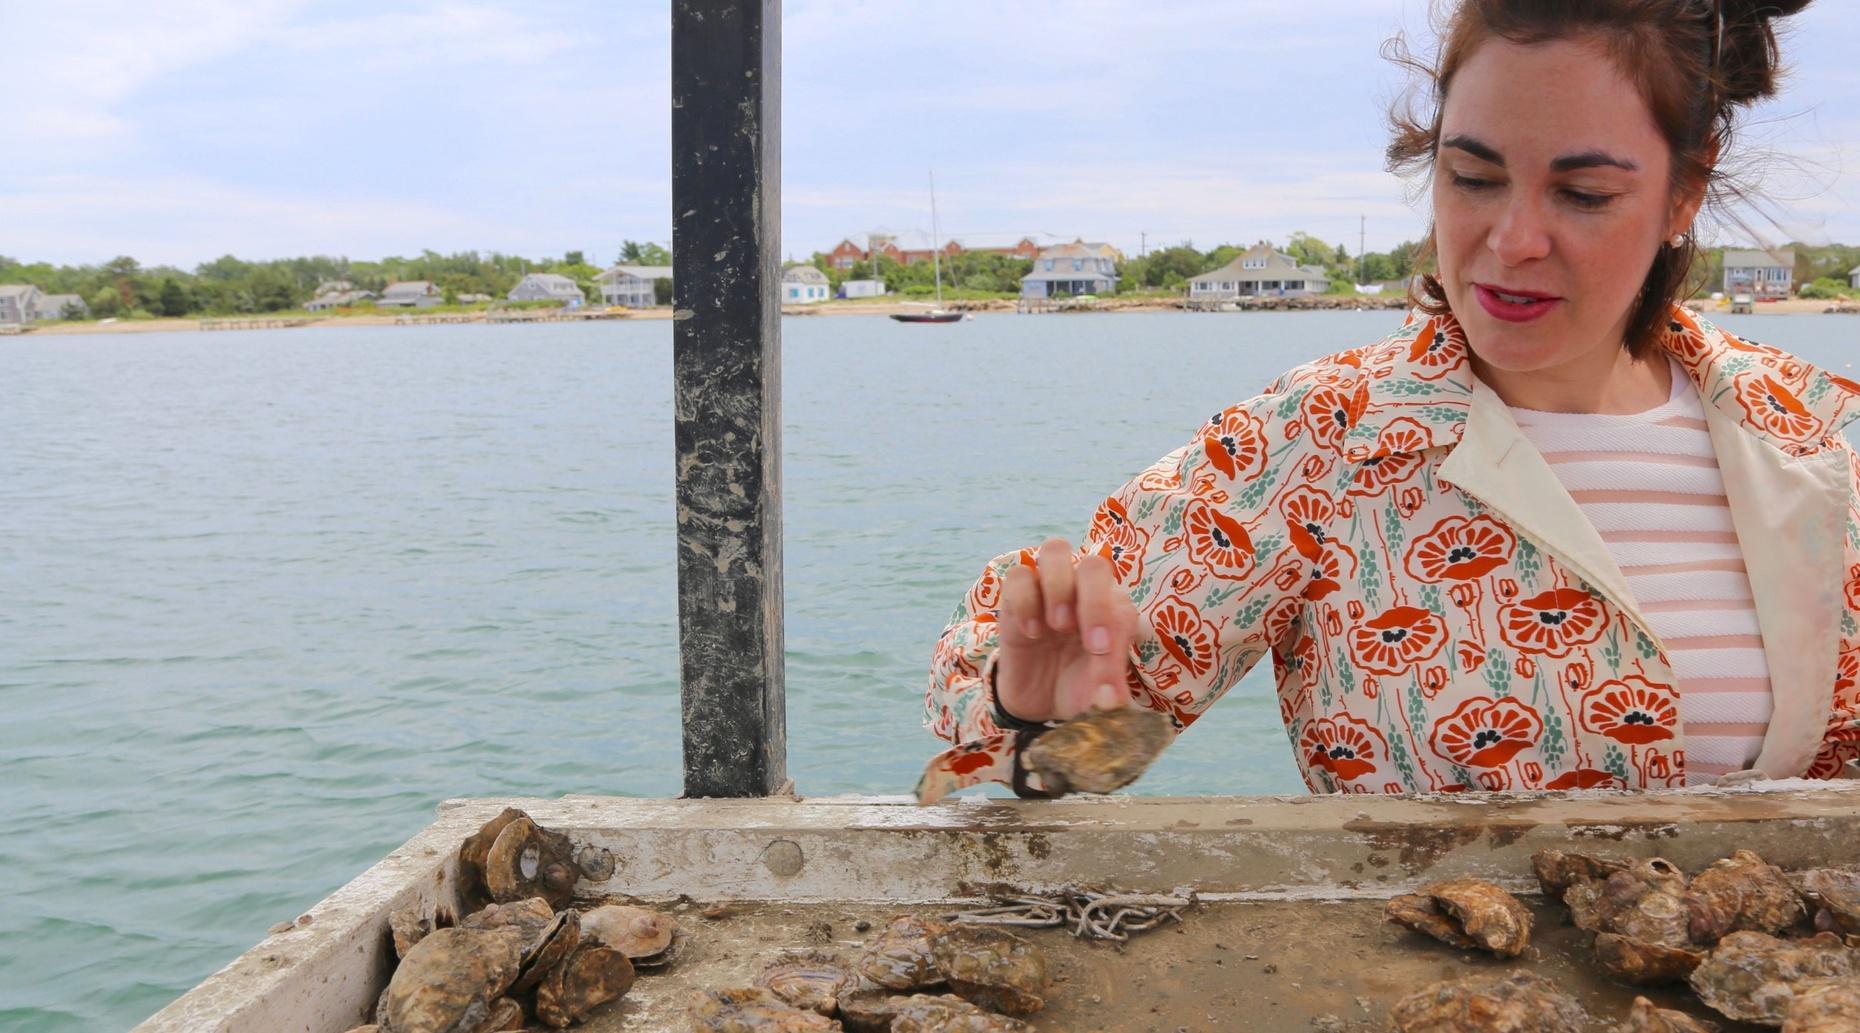 Martha's Vineyard Oyster Farm Tour & Aquaculture Education